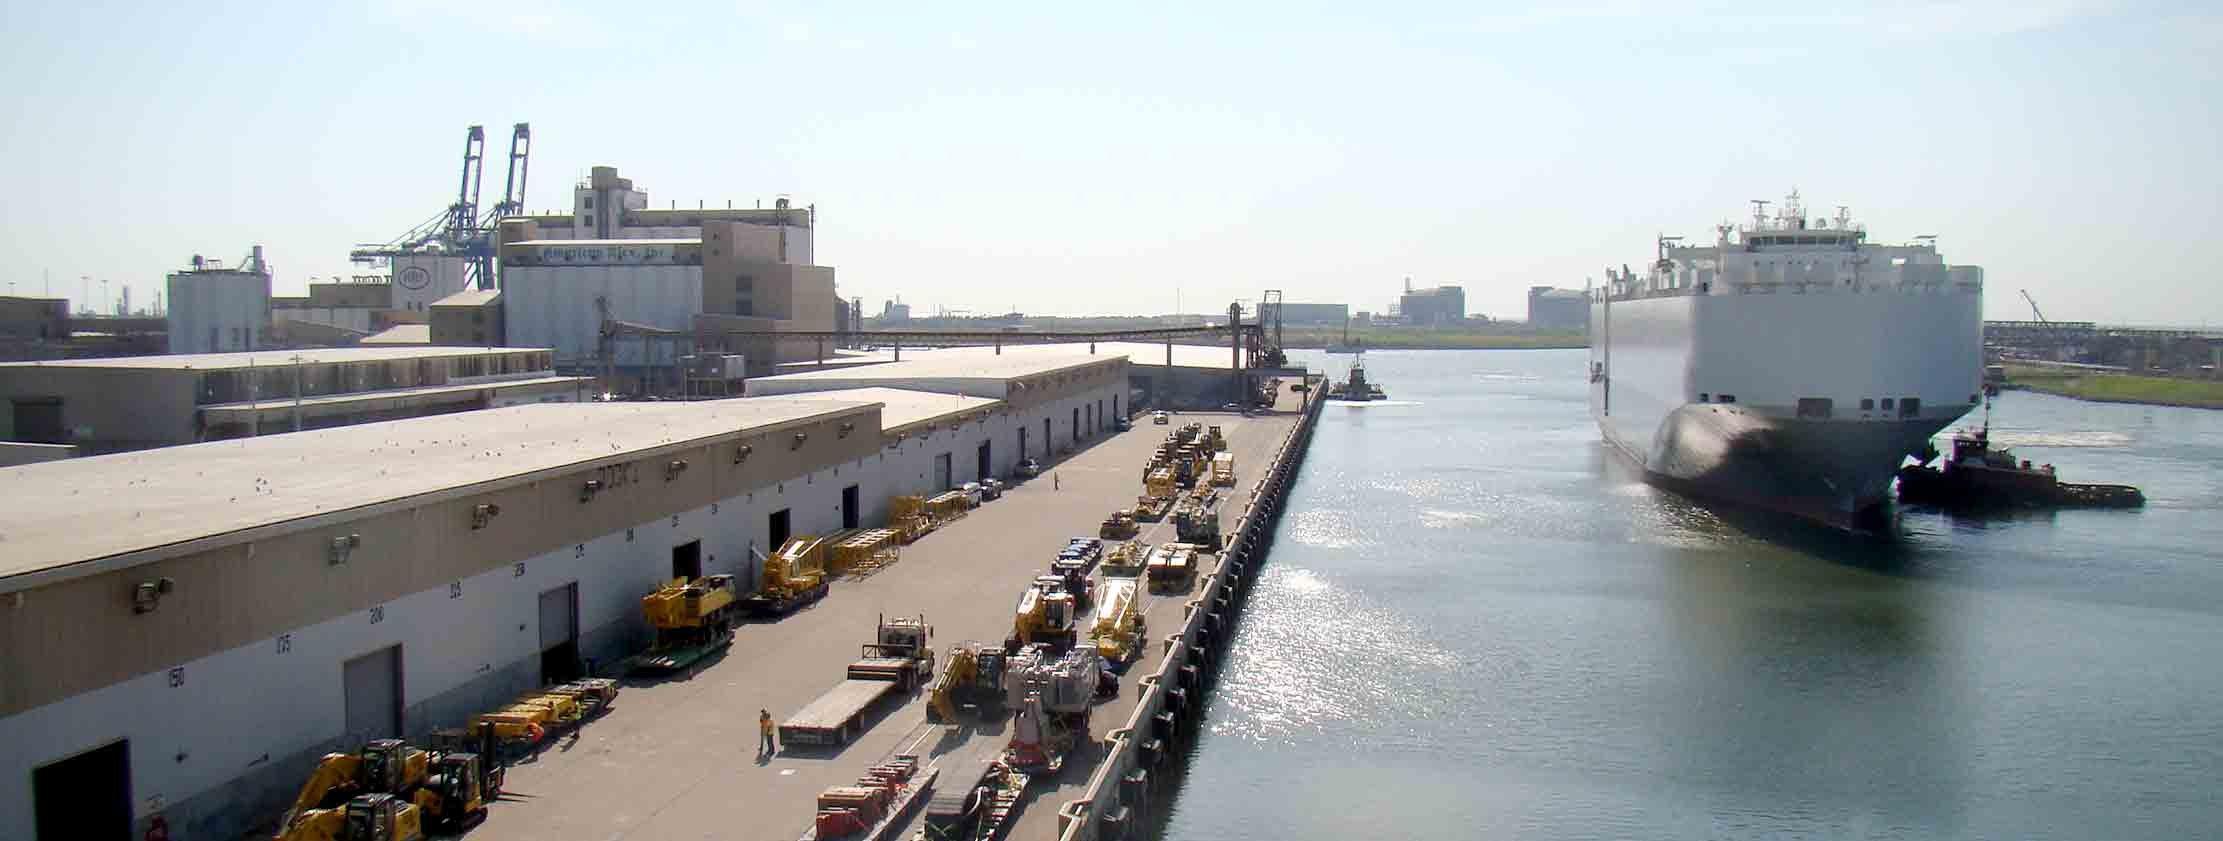 heavy-lift-operations-port-freeport